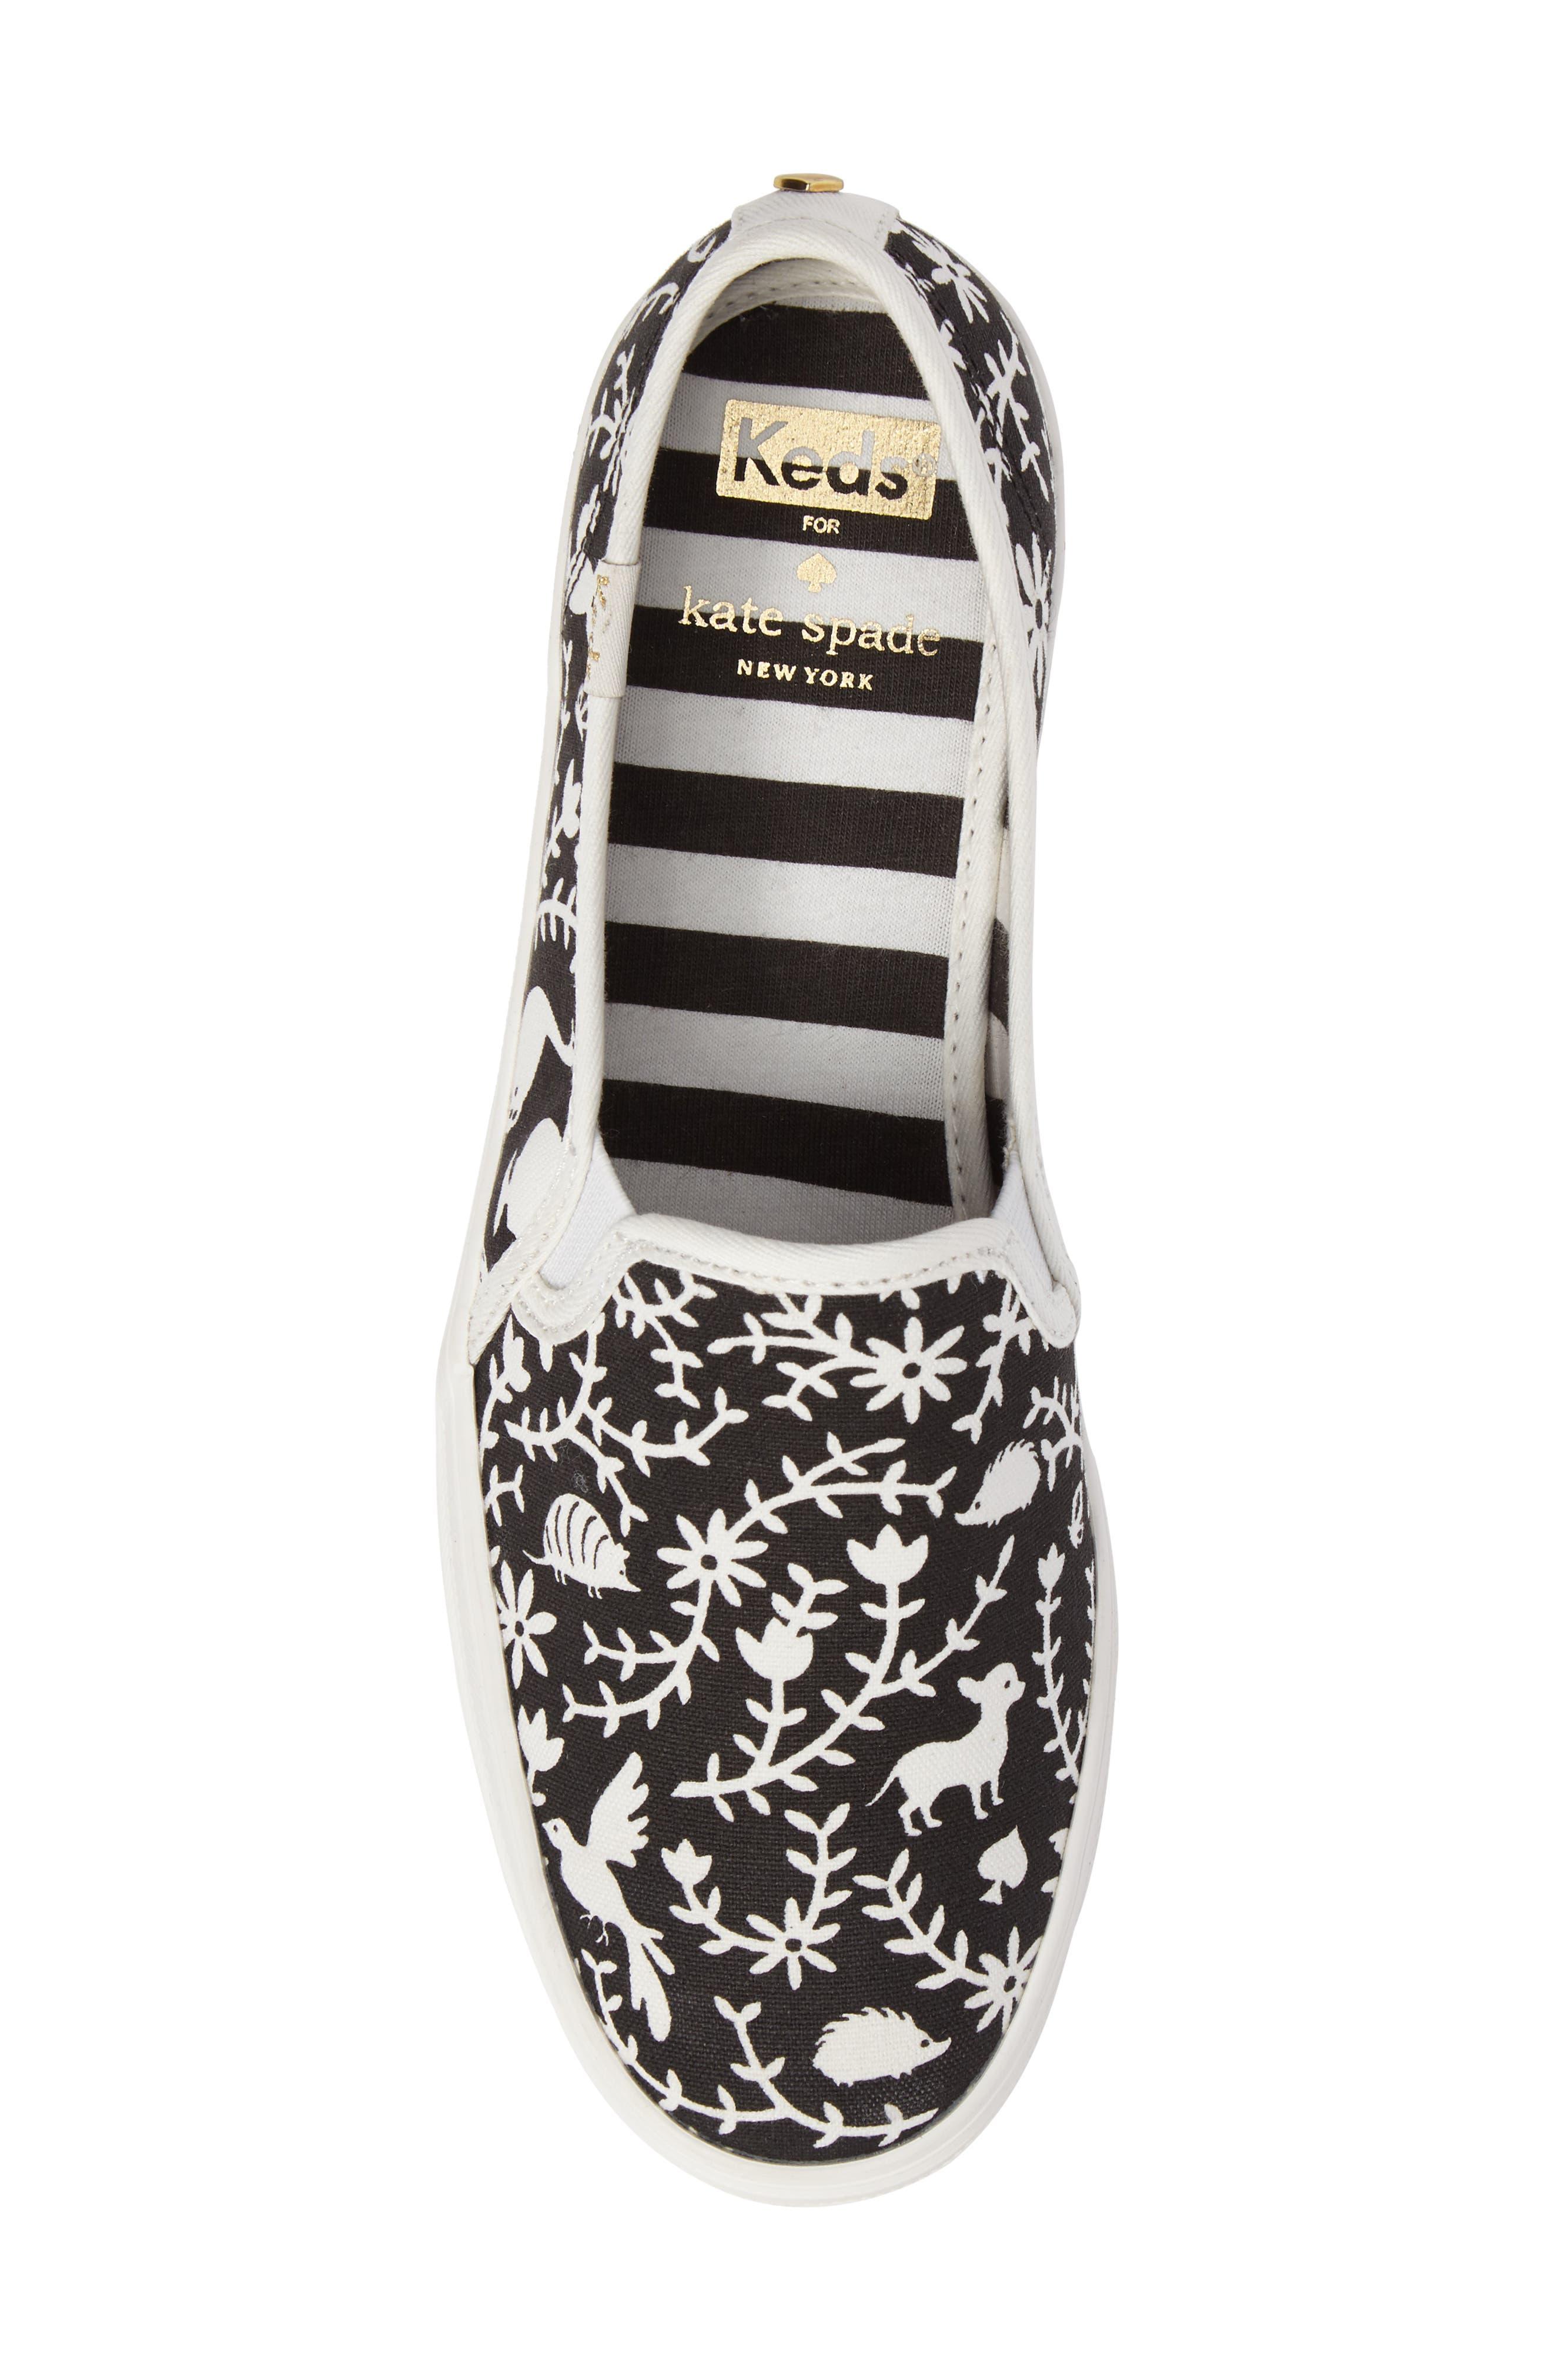 Keds<sup>®</sup> x kate spade Triple Decker Slip-On Sneaker,                             Alternate thumbnail 9, color,